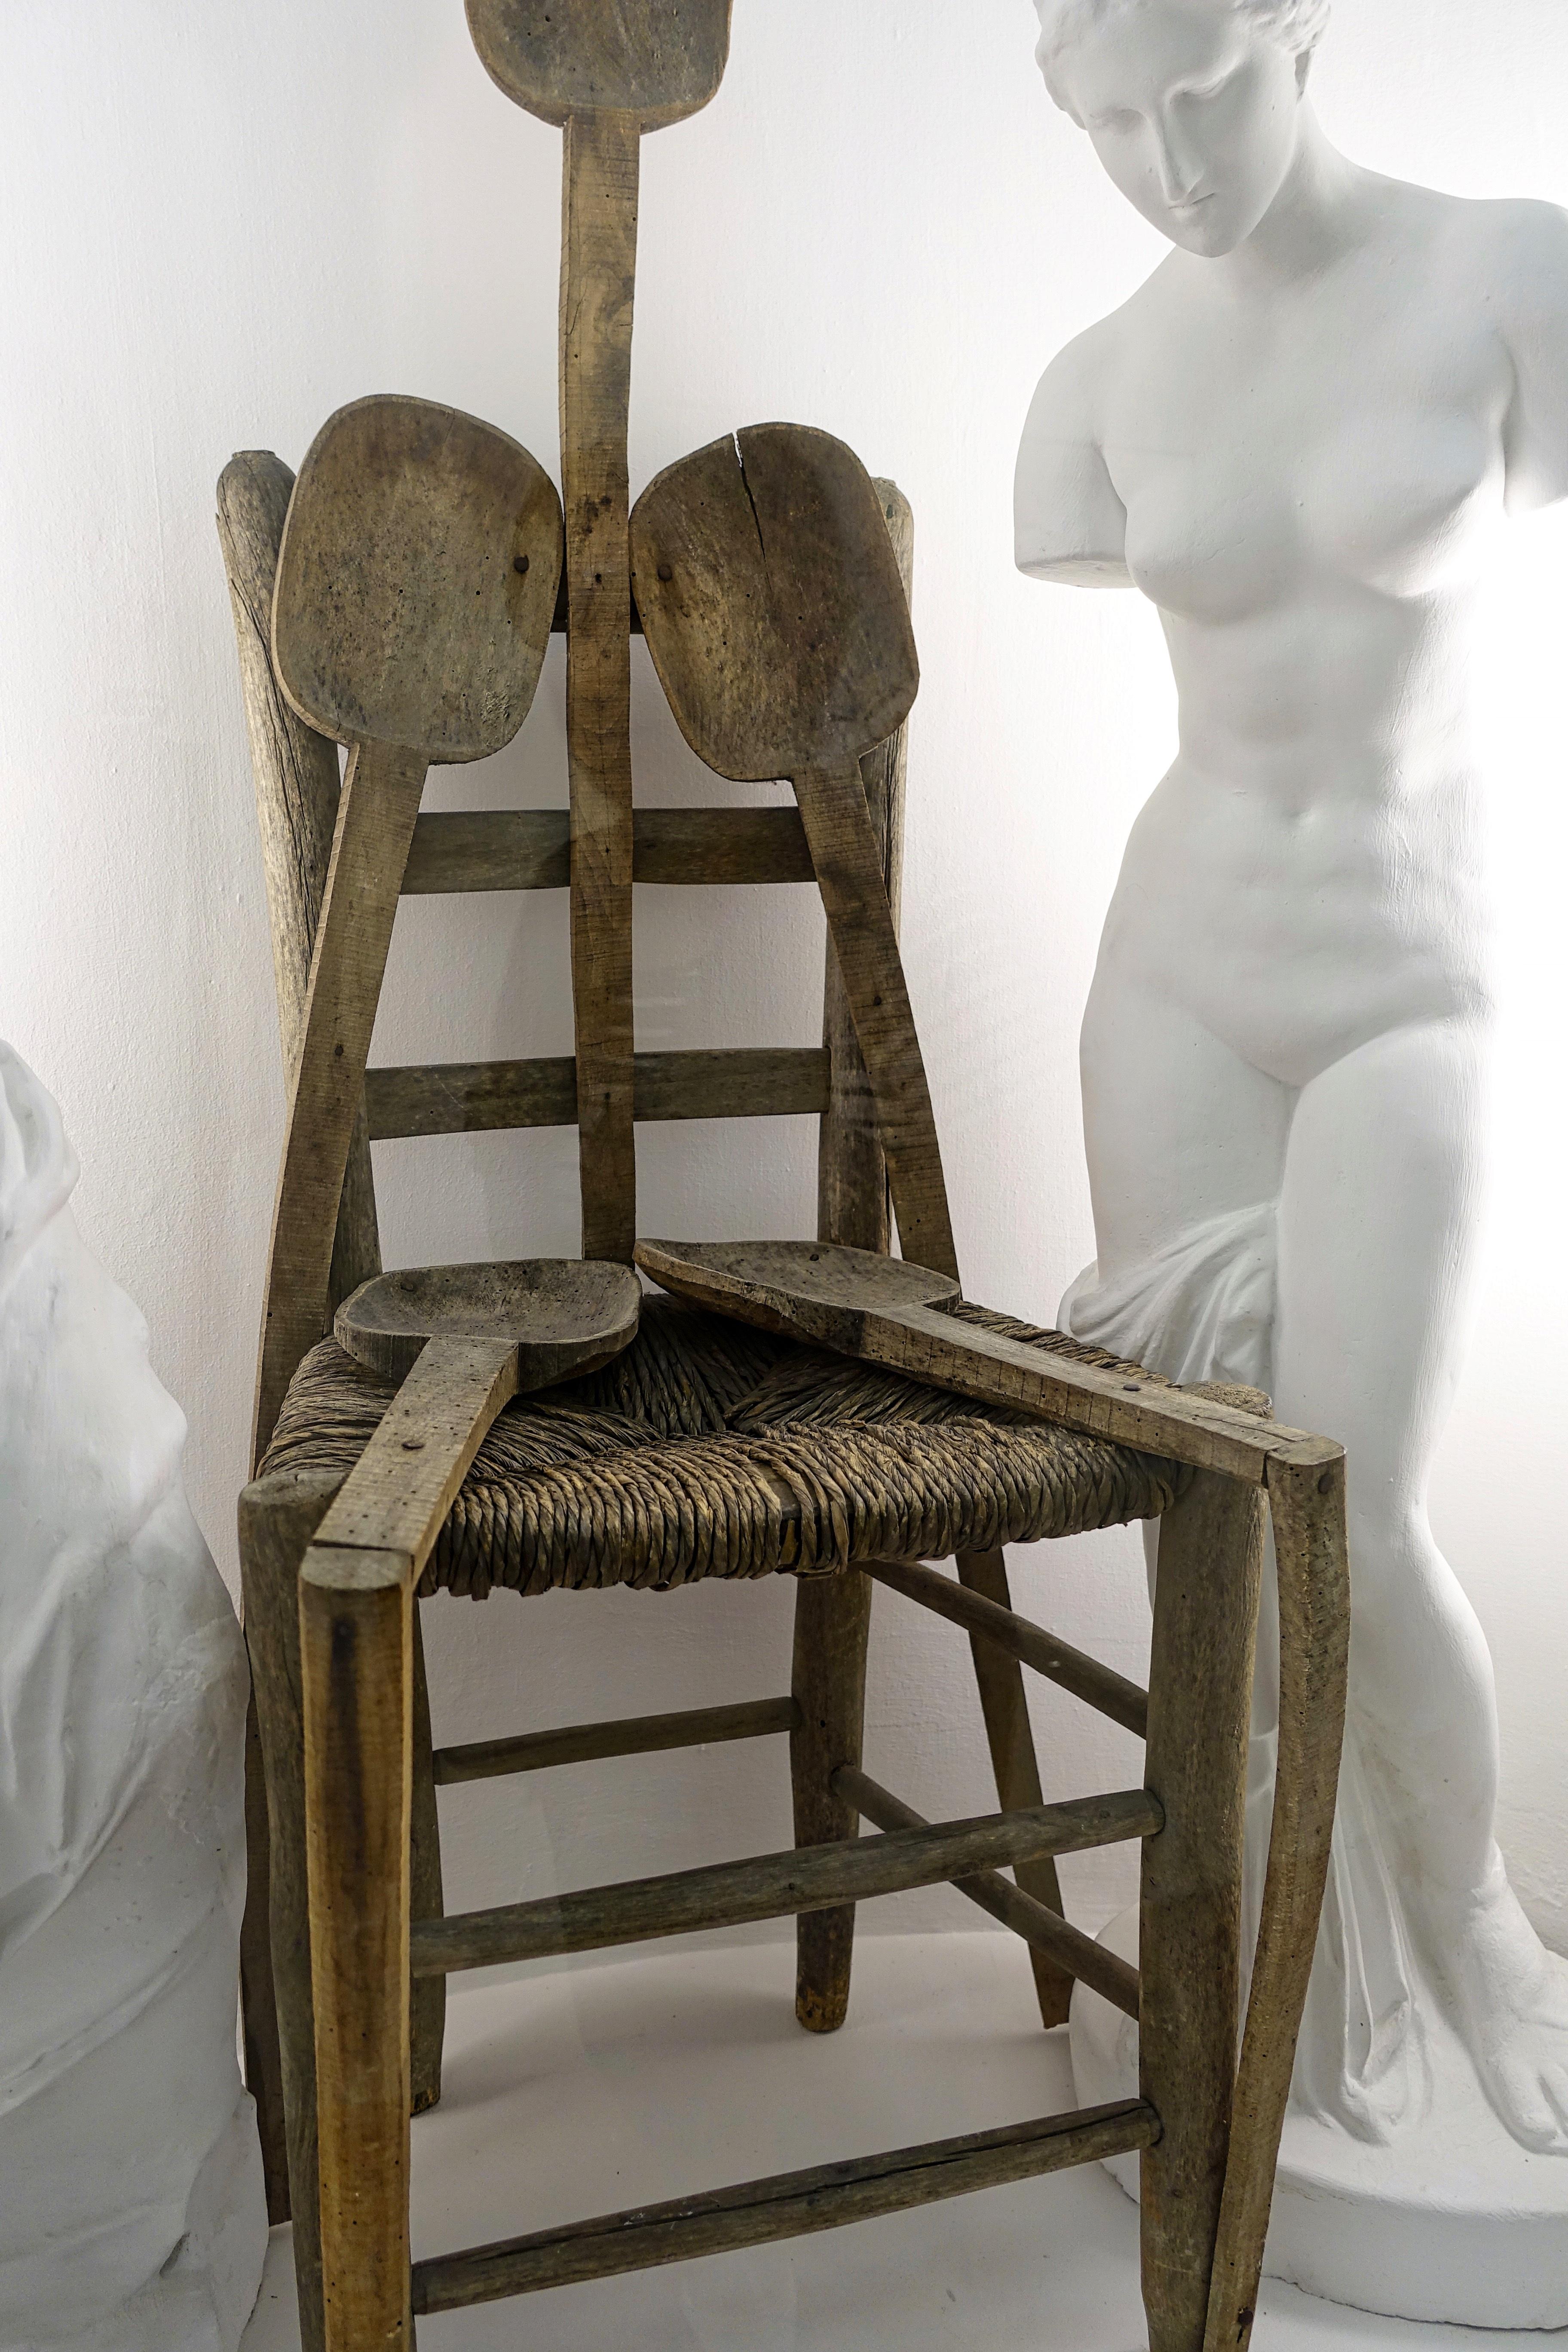 Fotos Gratis Madera Silla Piedra Estatua S Mbolo Sentado  # Muebles Fundidos Artisticos